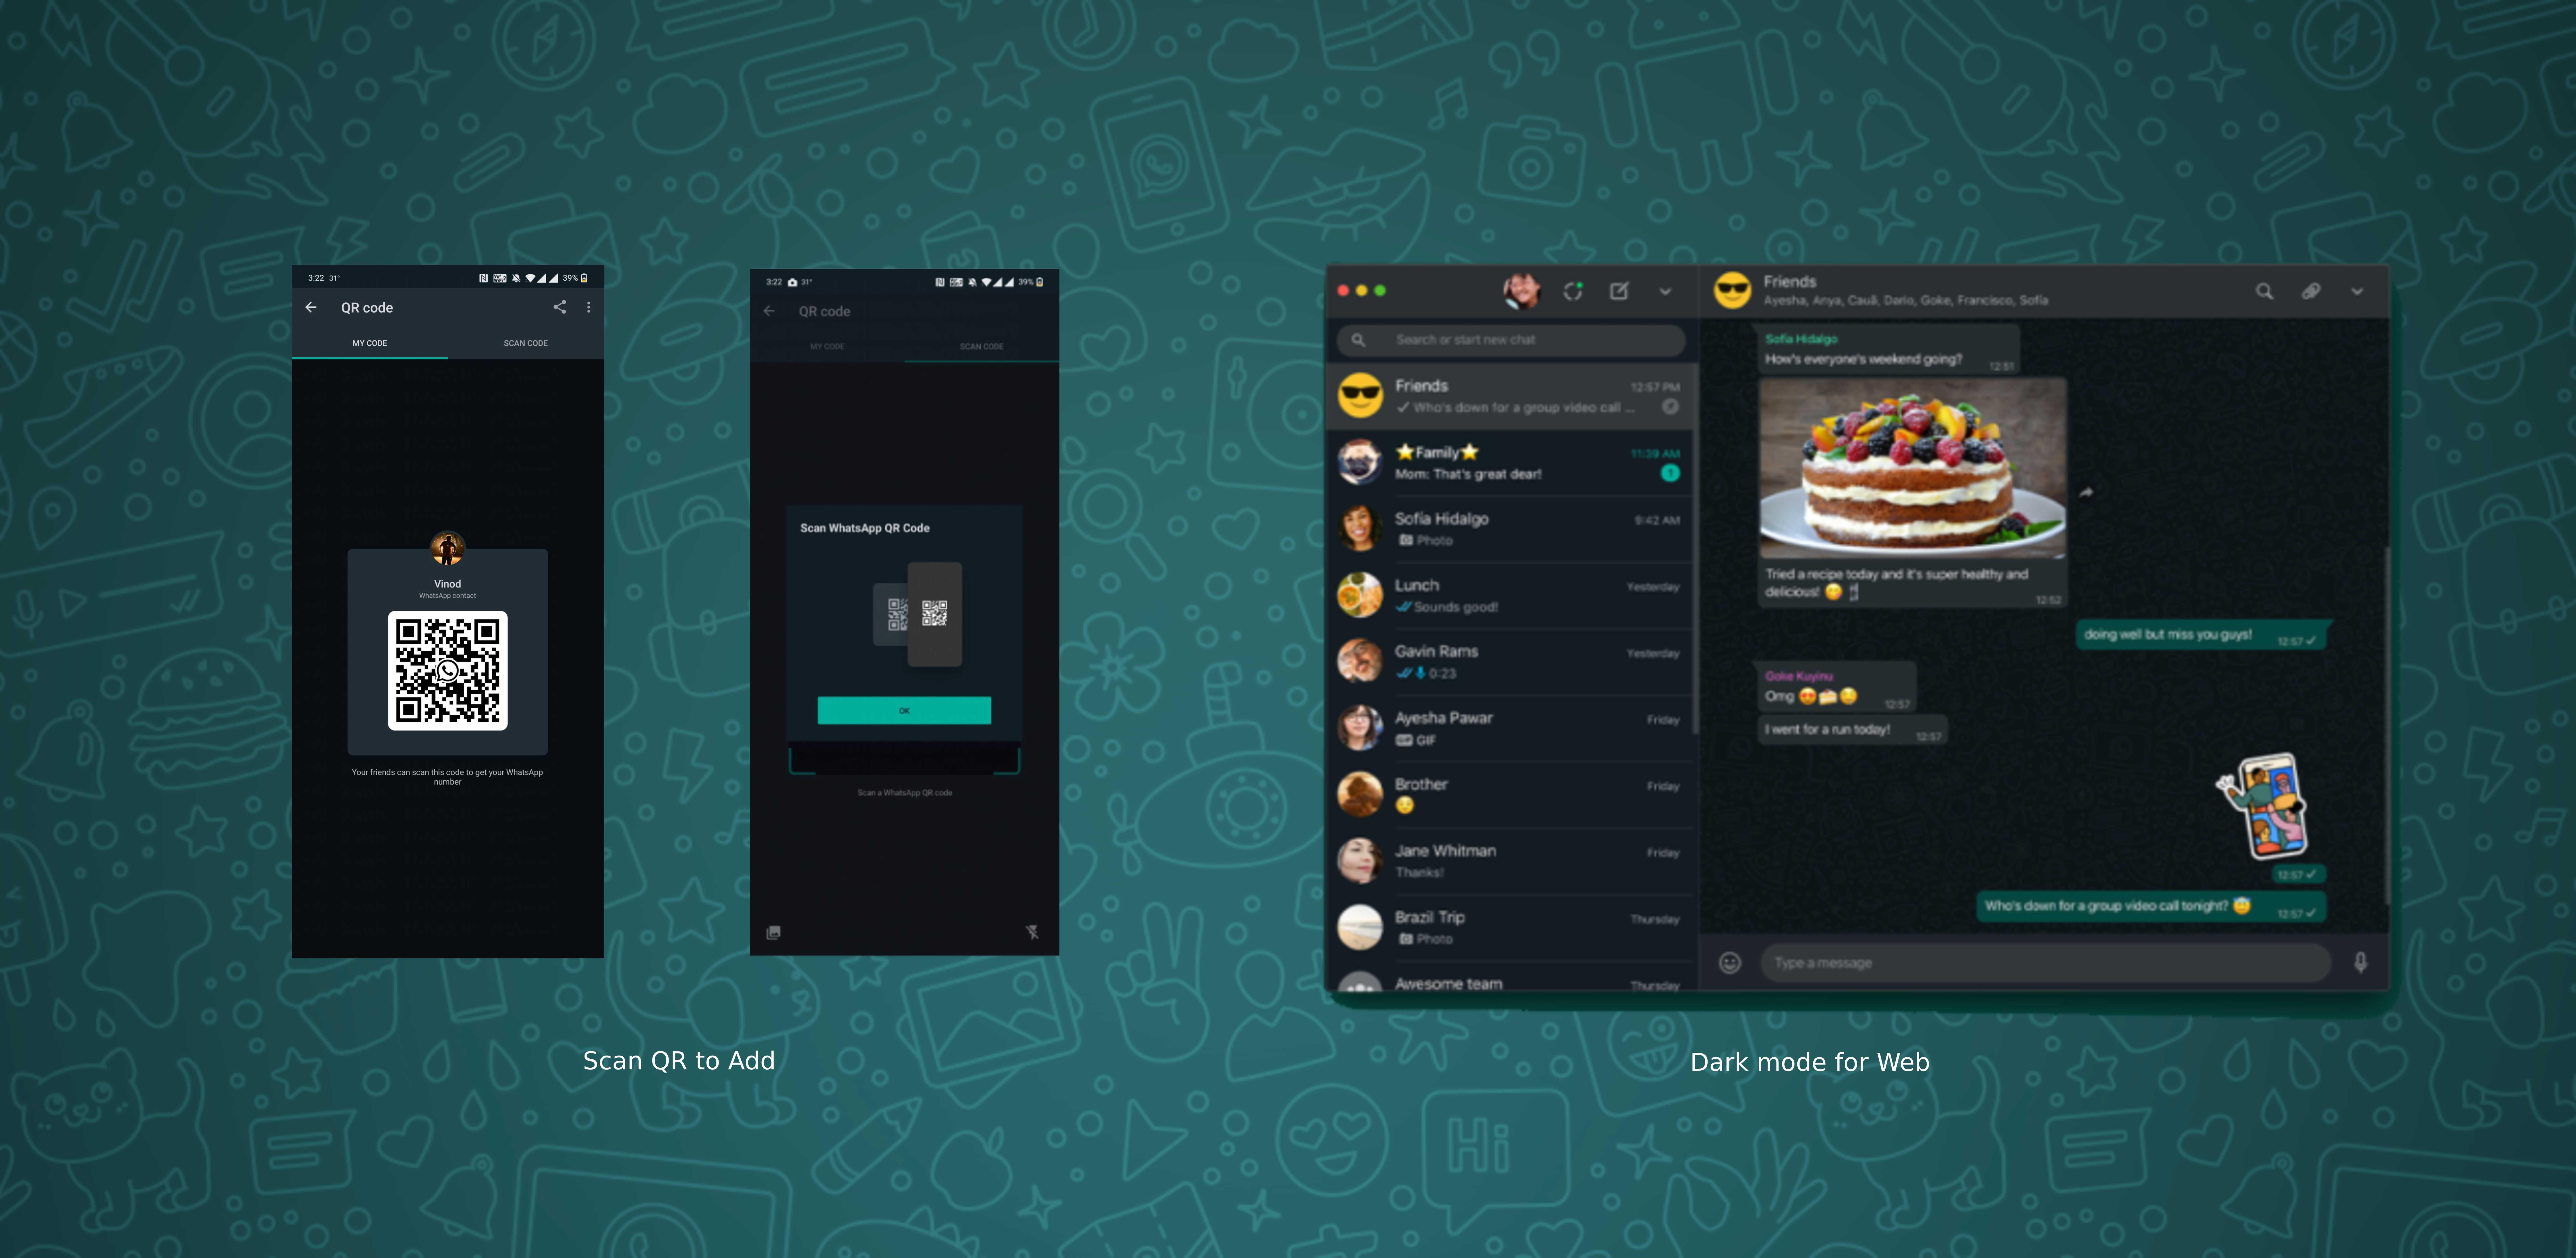 WhatsApp-Background-Wallpaper (1)